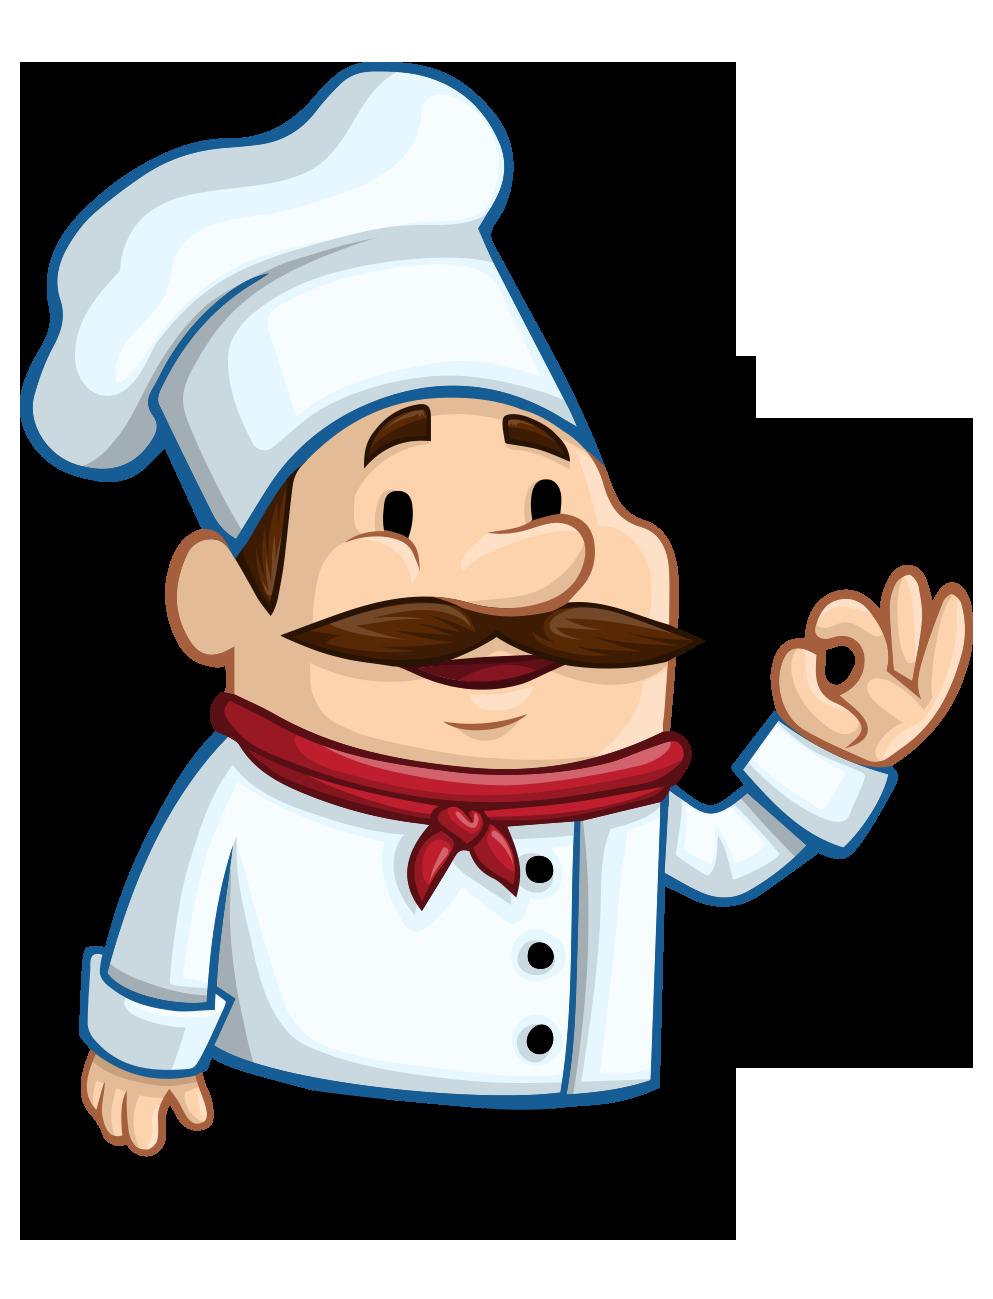 سـكرابـز شيفات وحلويات بدون تحميل Character Mario Characters Disney Characters